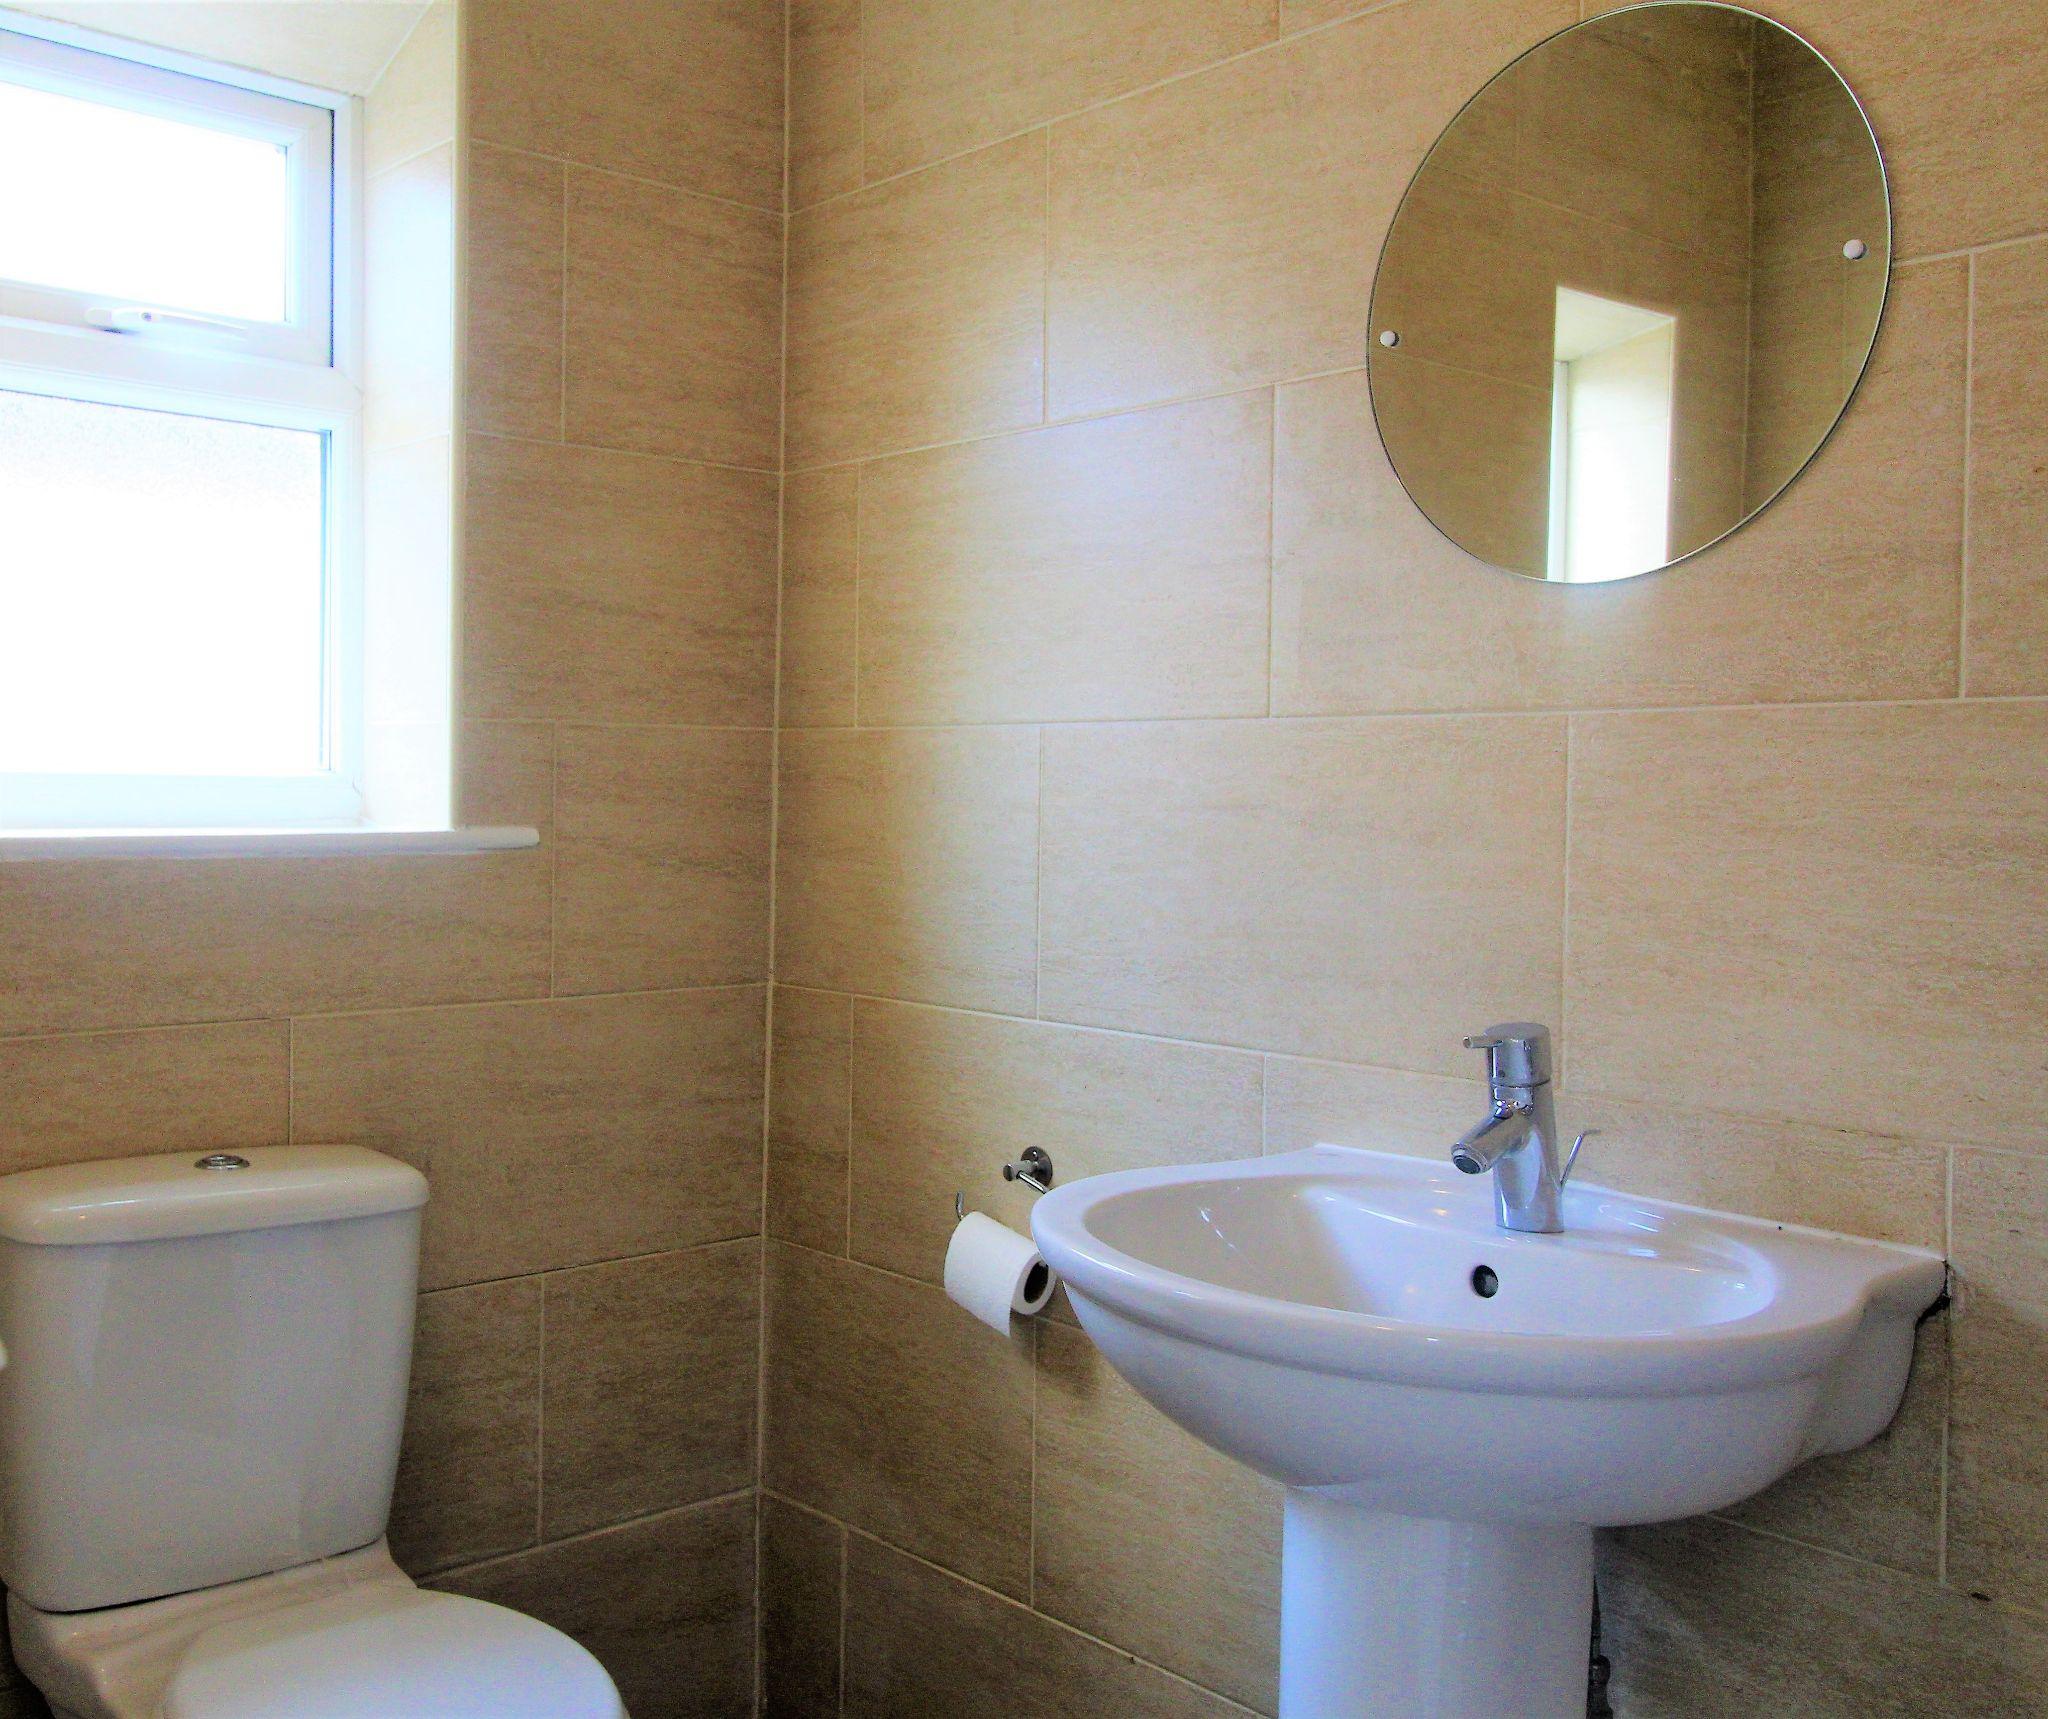 3 Bedroom Detached House For Sale - Bathroom 1